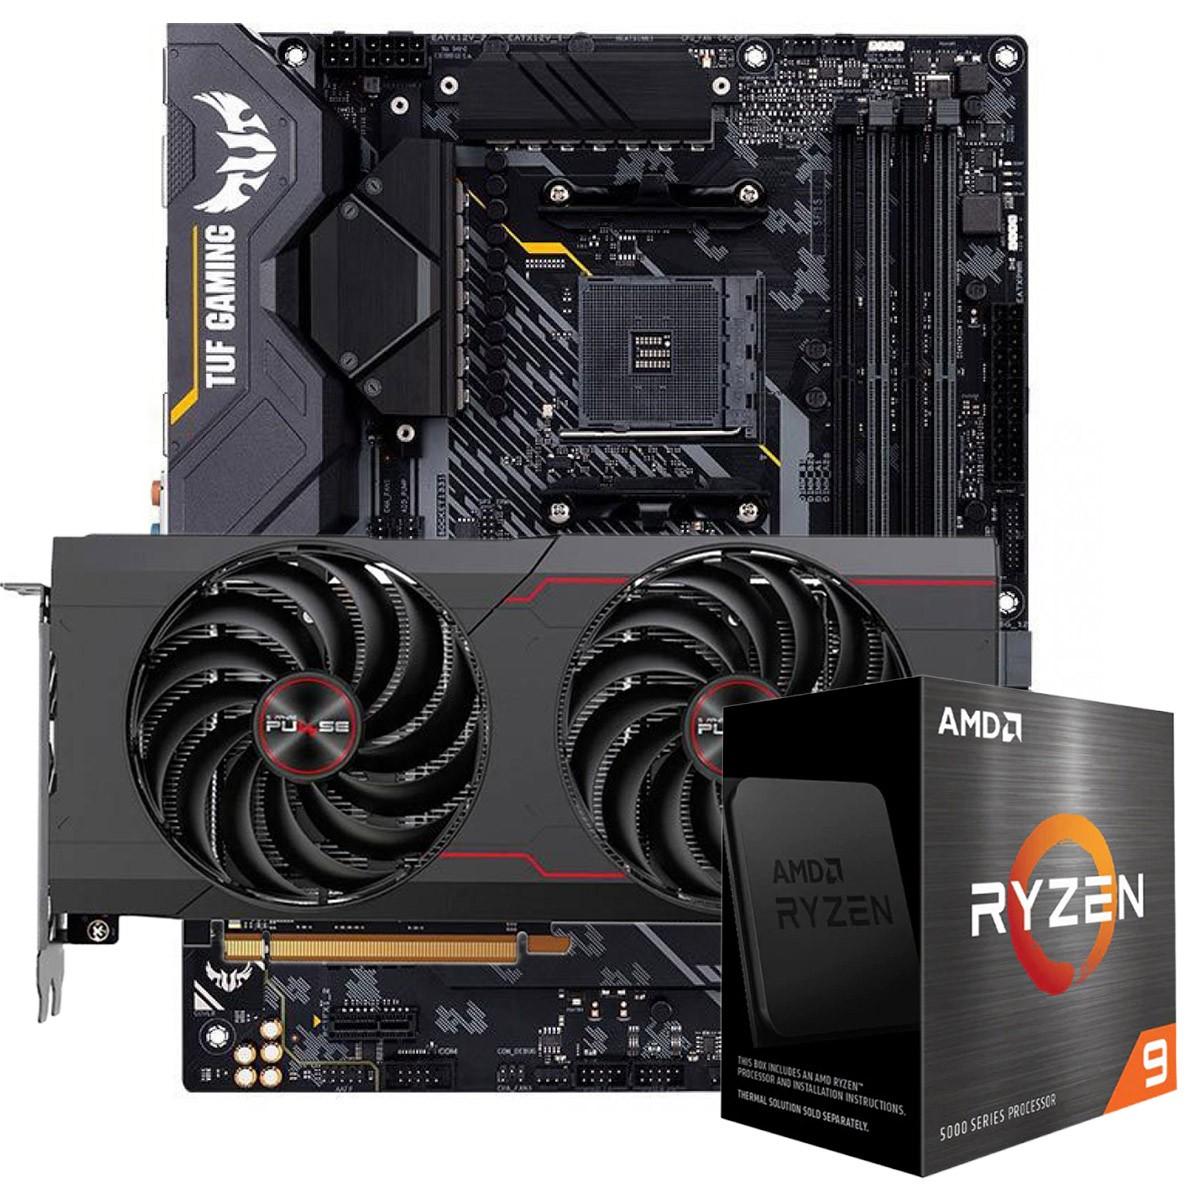 Kit Upgrade Sapphire Pulse Radeon RX 6700 XT + AMD Ryzen 9 5900X + ASUS TUF Gaming X570-Plus